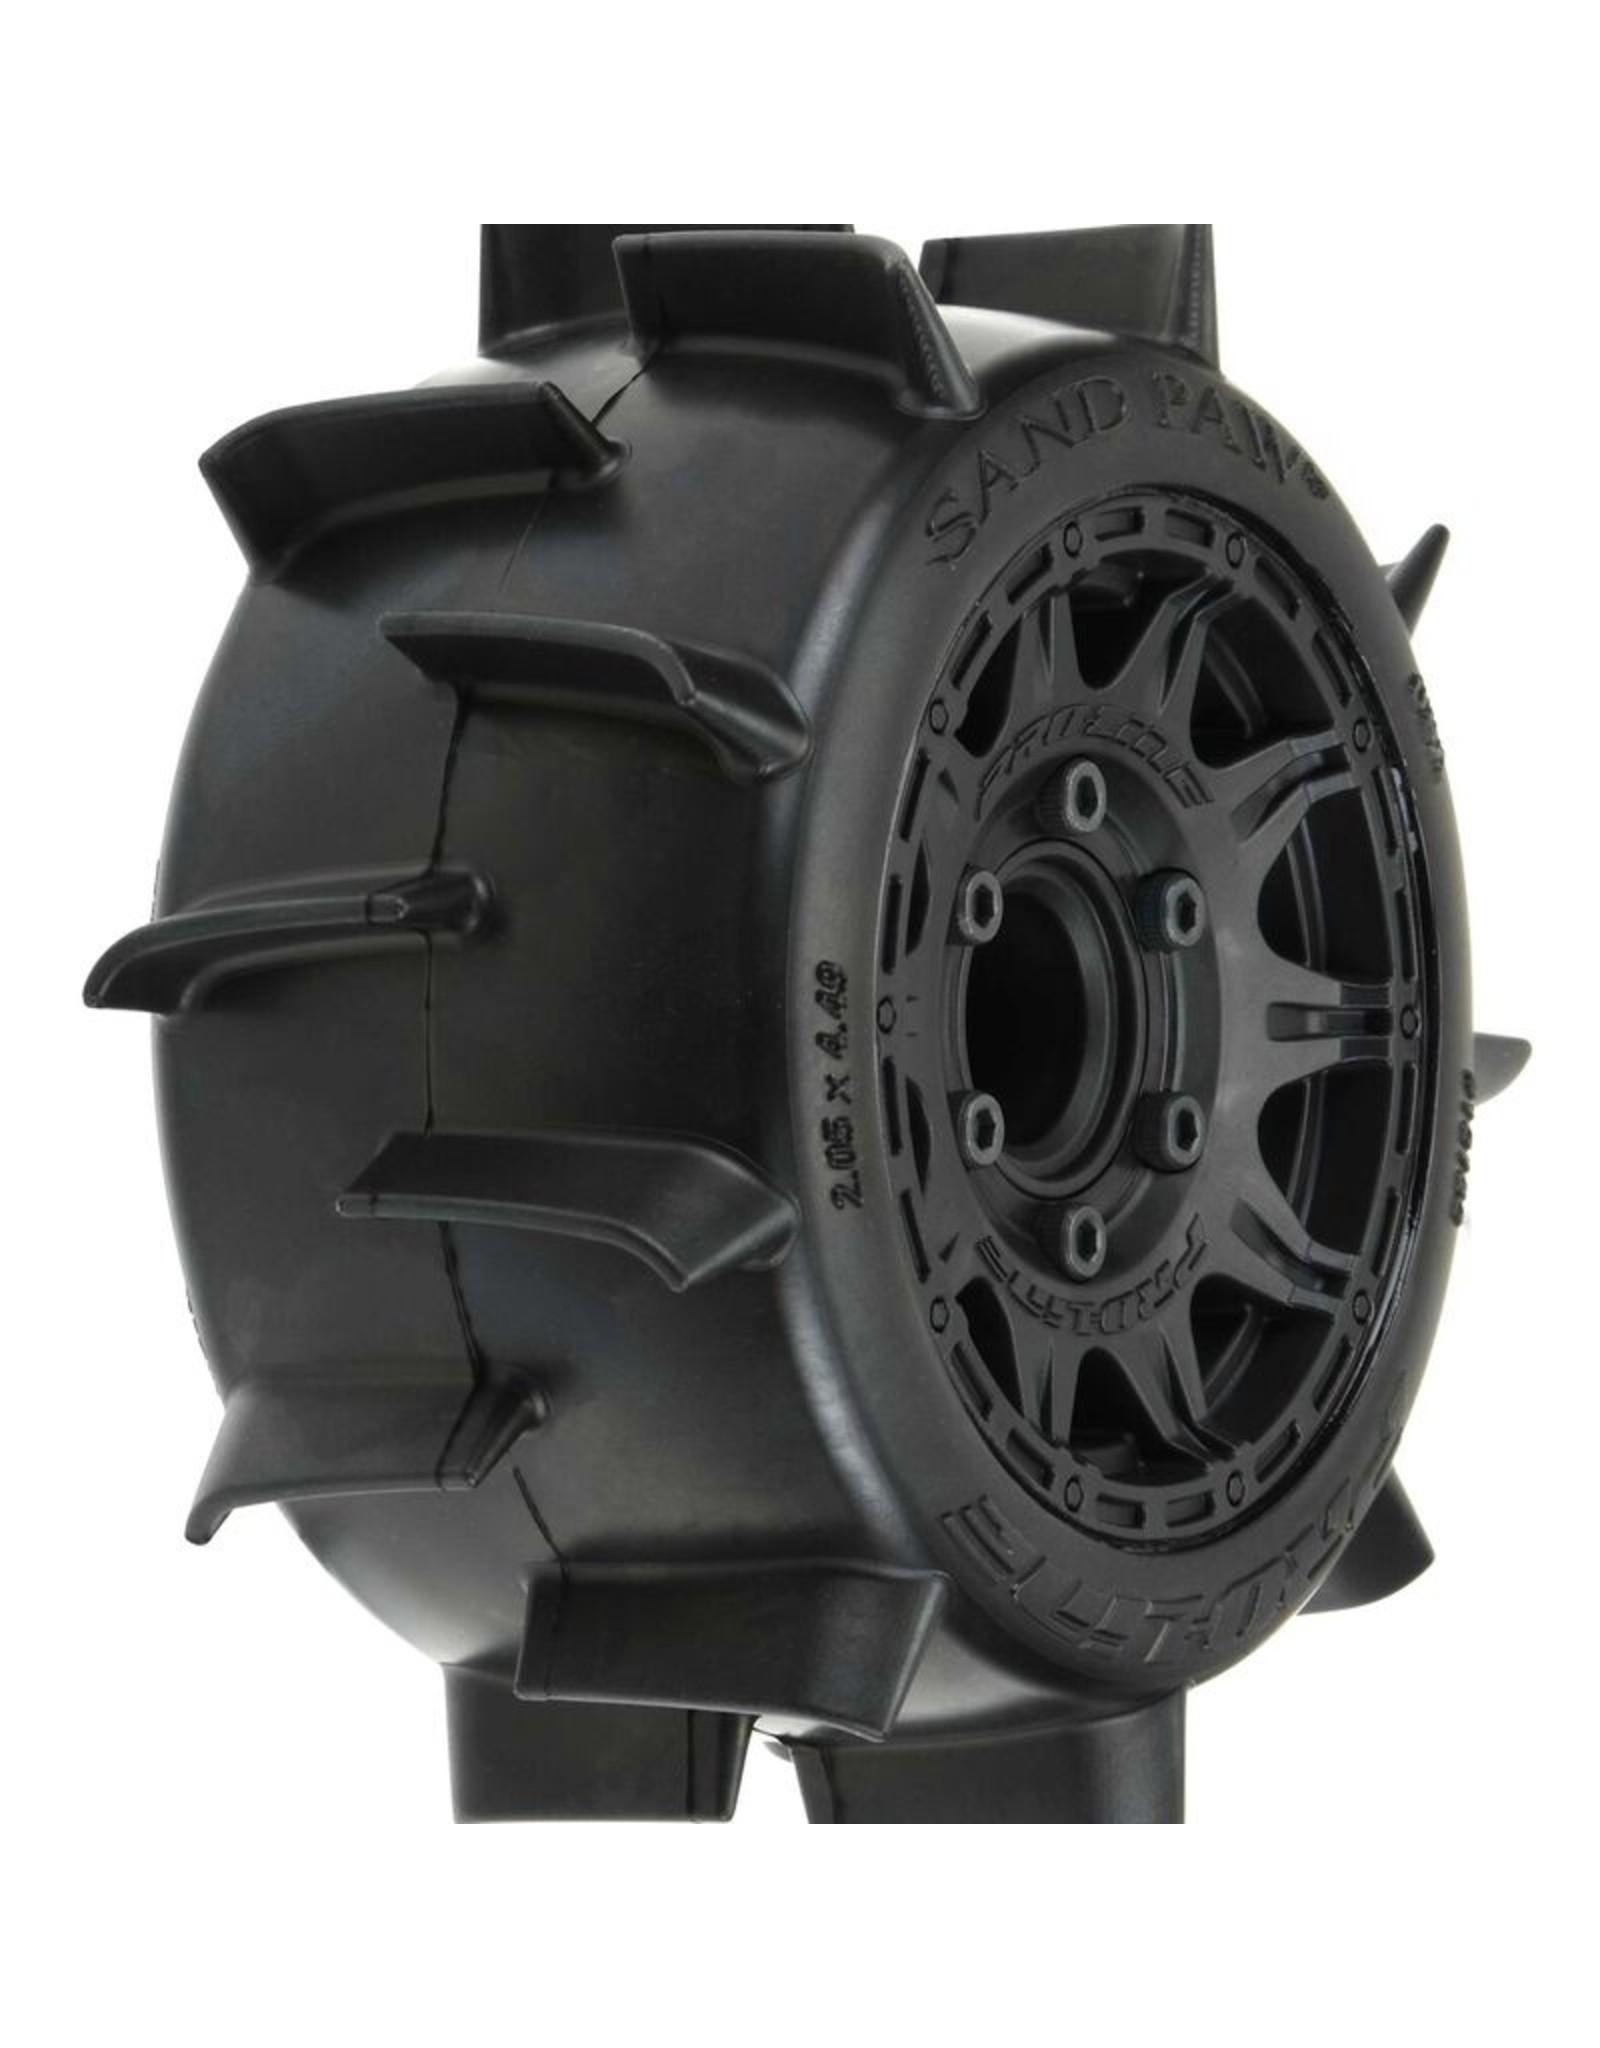 "Pro-Line PRO1016010 - Sand Paw LP 2.8"" Mounted Raid Black 6 x 30 Tires - Front/Rear"